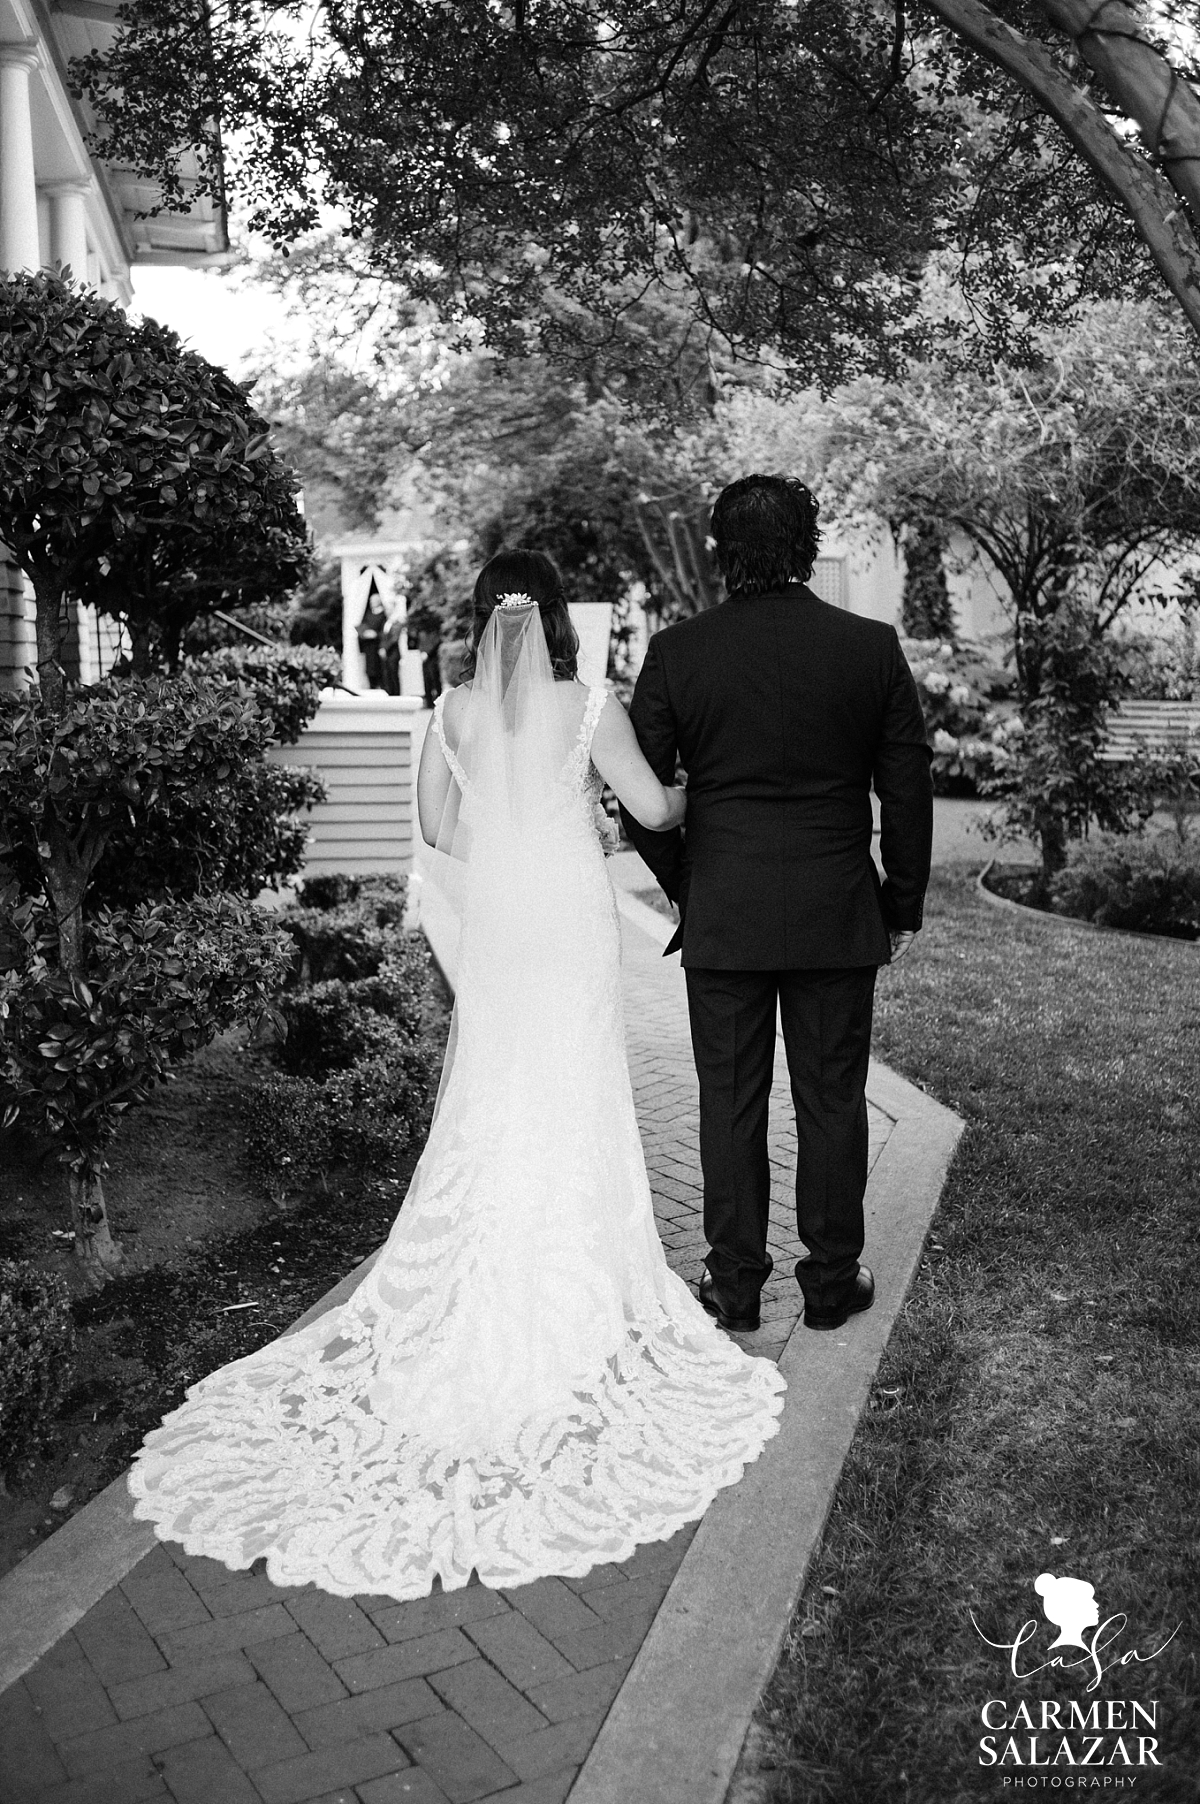 Father walking bride down aisle at Vizcaya - Carmen Salazar